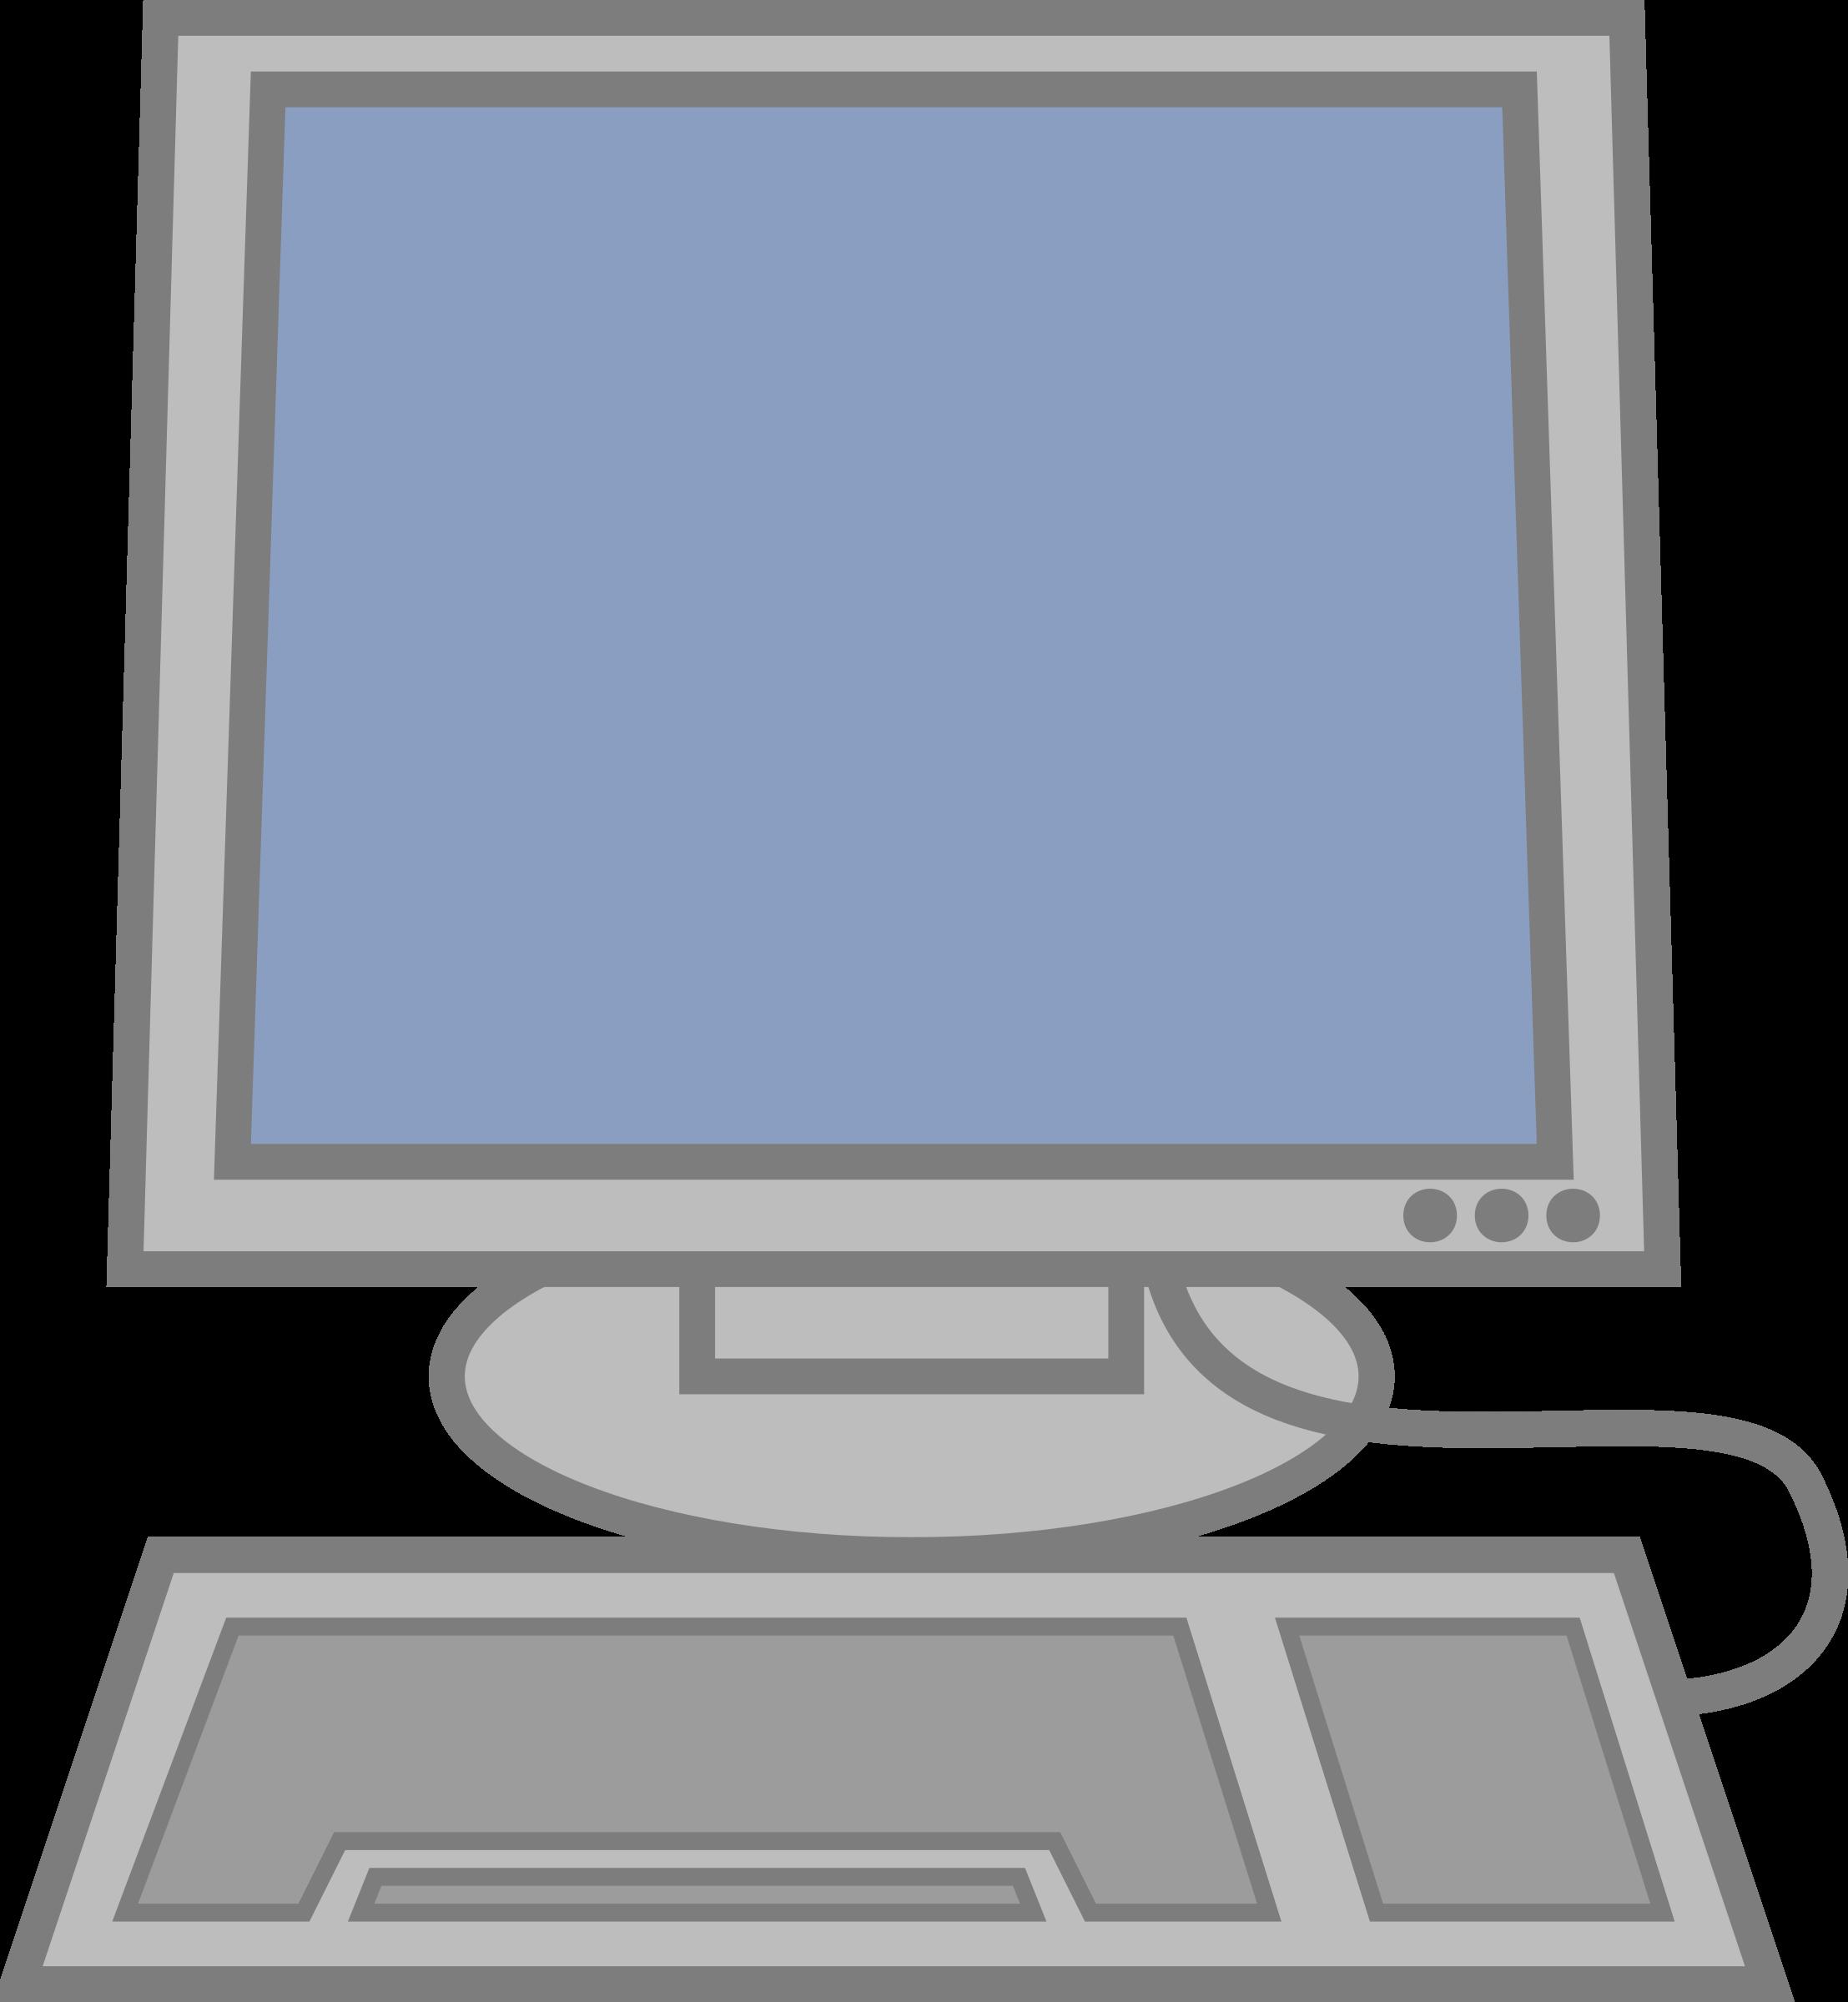 Computer Clip Art Free Download.